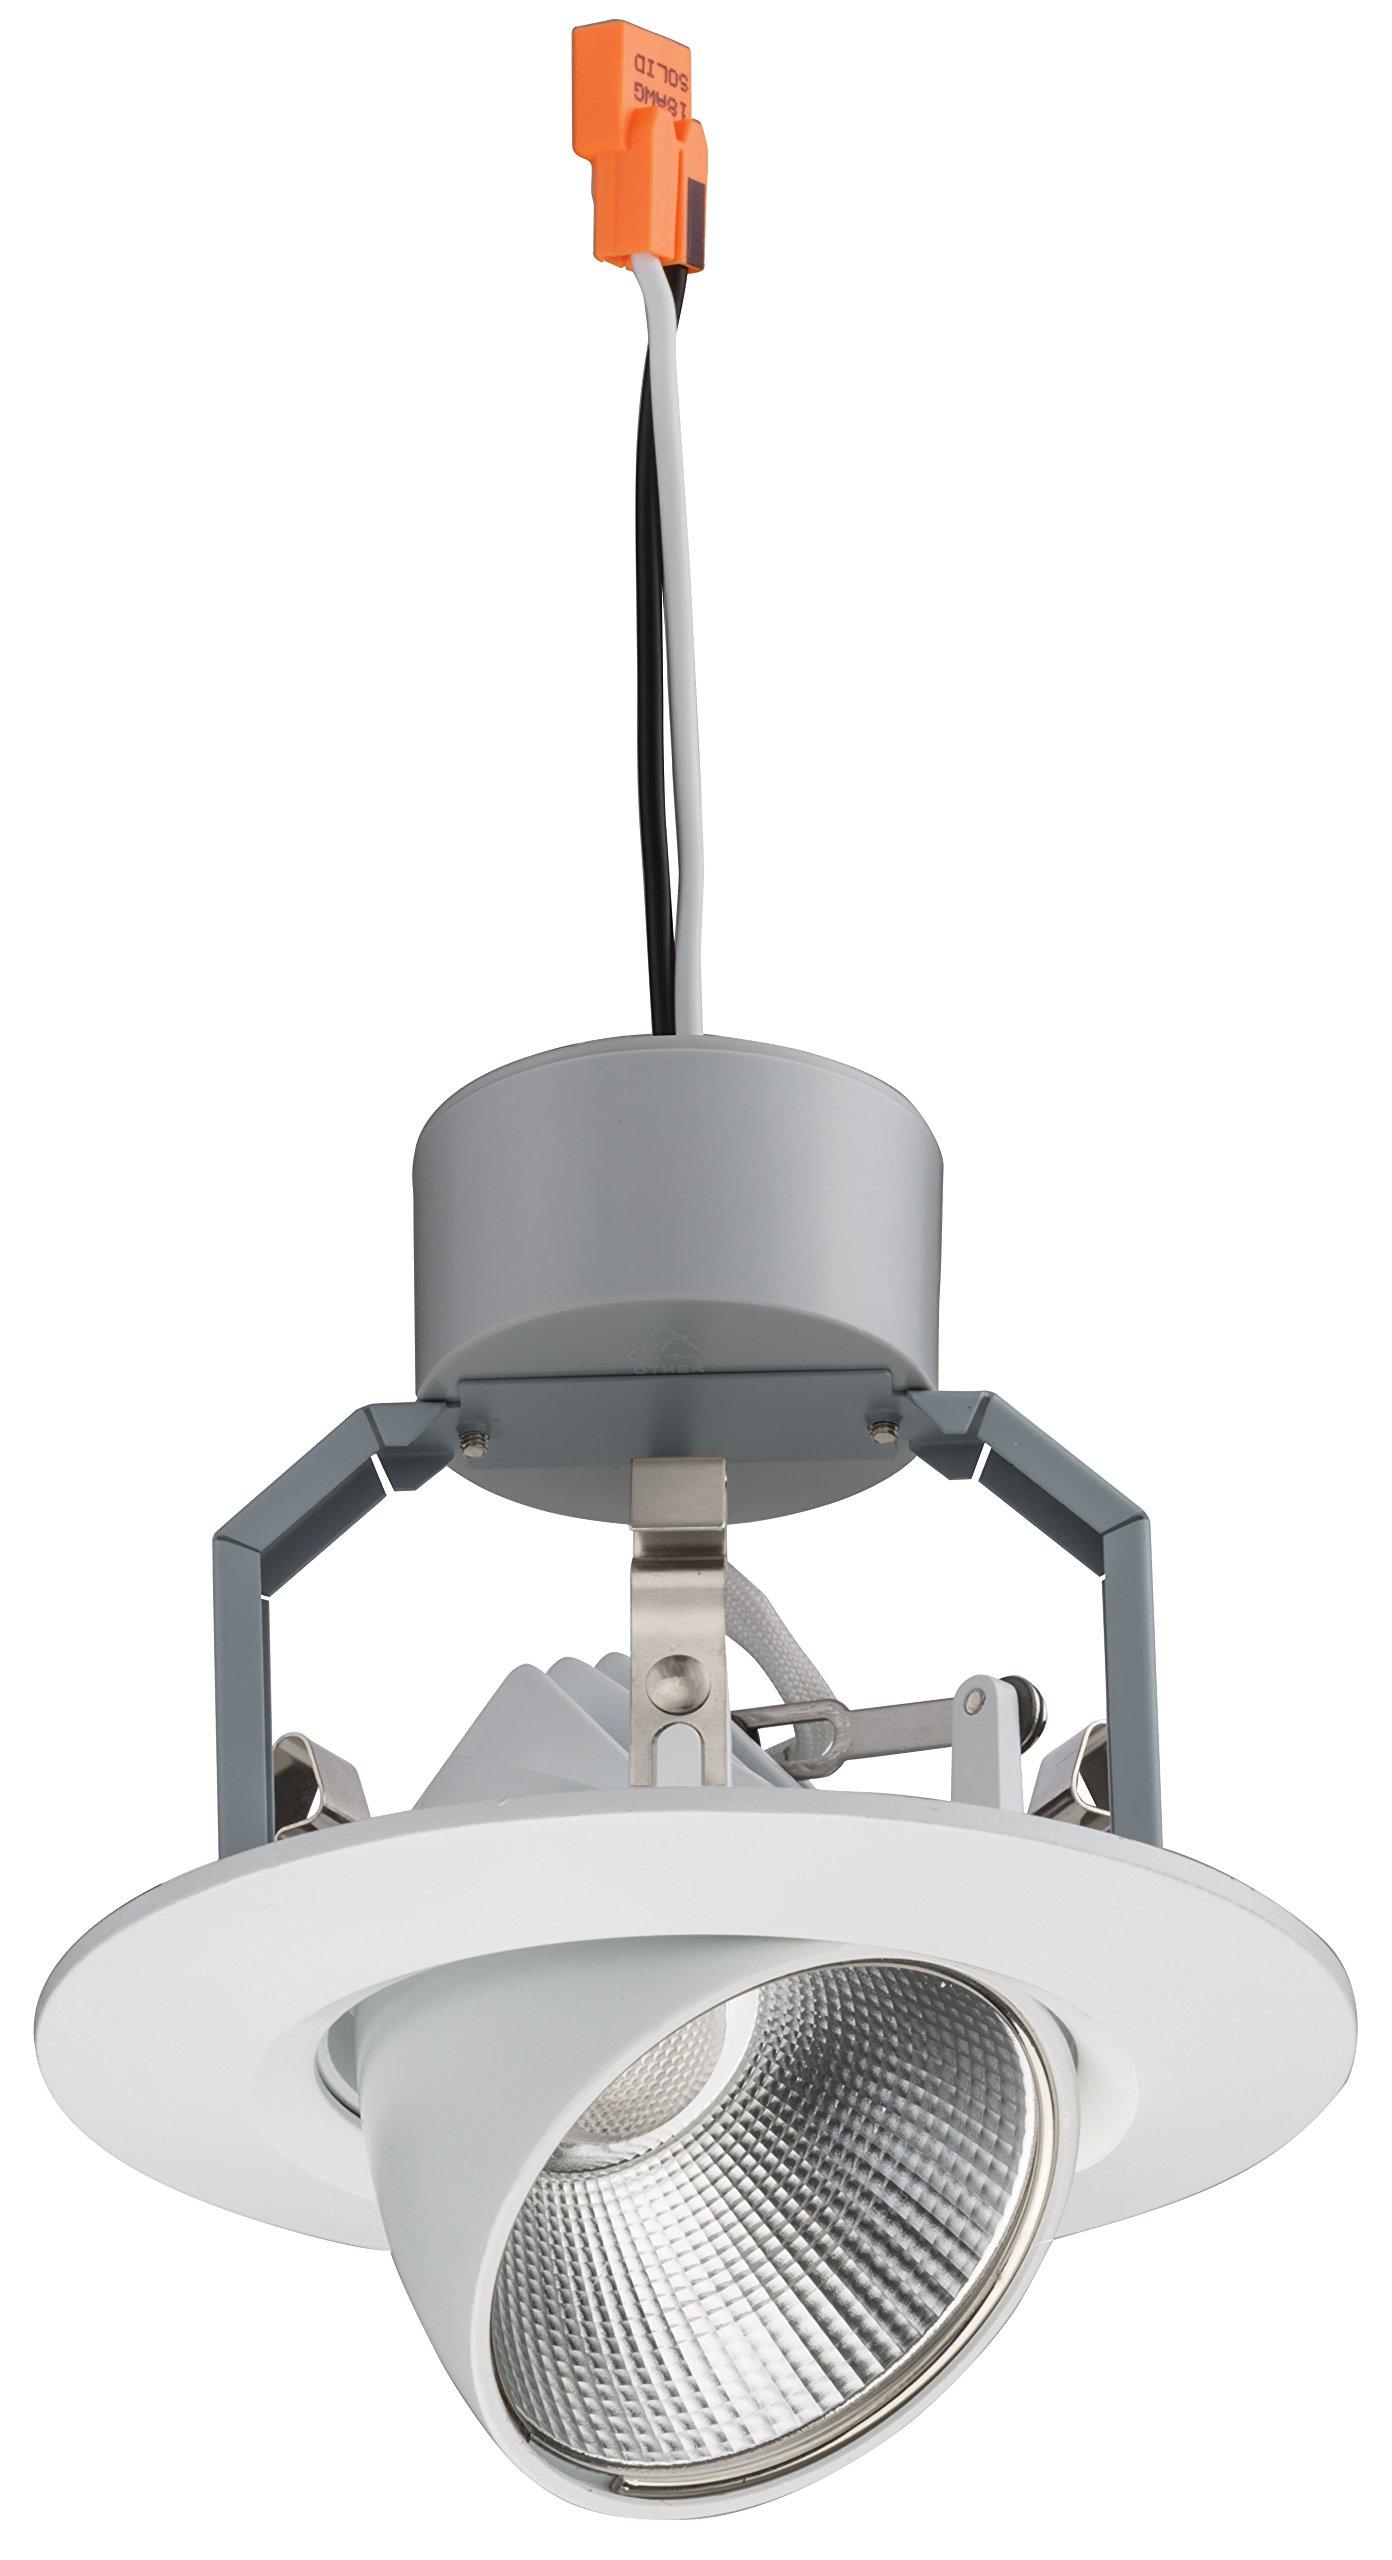 Lithonia Lighting 4IGMW LED 30K 90CRI M6 640 lm 3000K LED iGimbal Module, 4'', Matte White